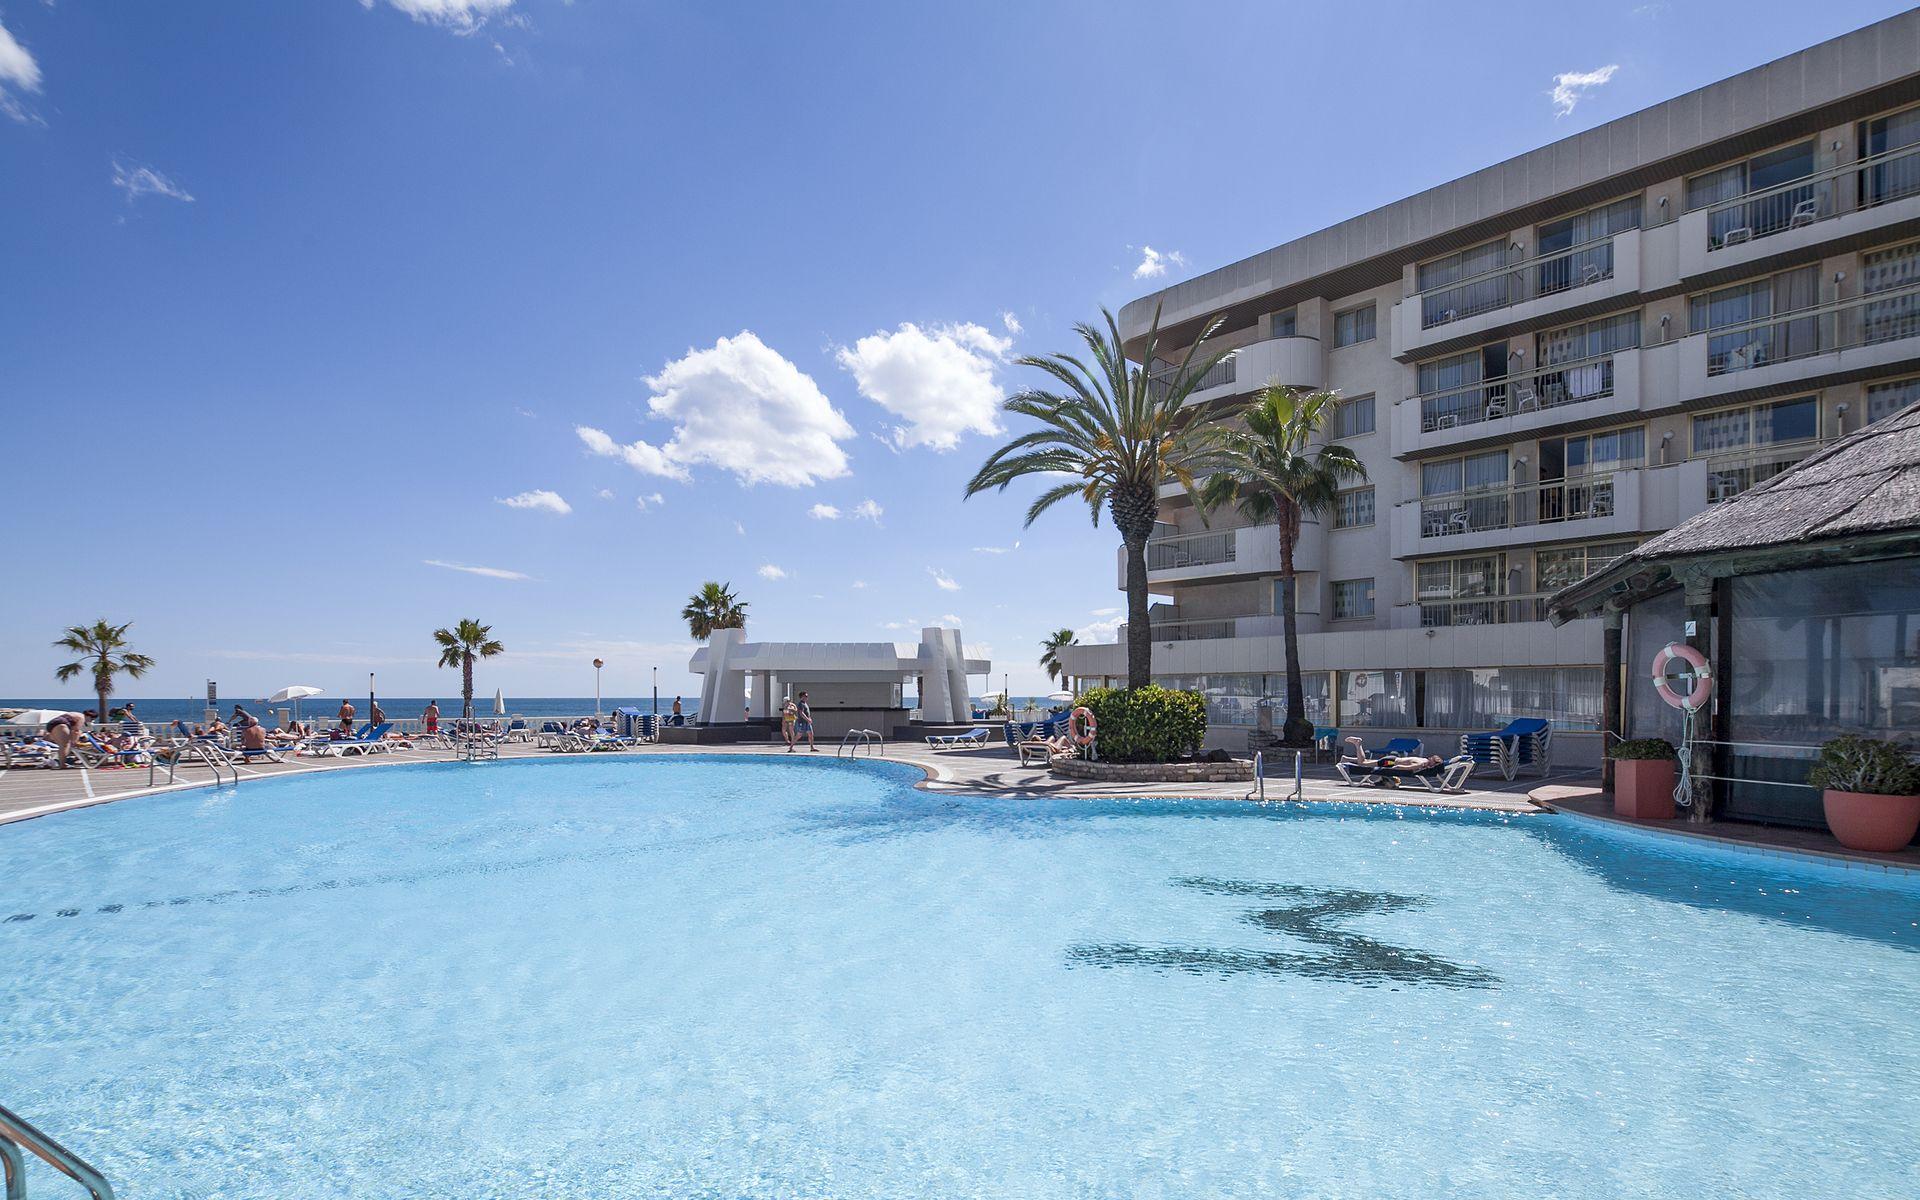 Hotel best maritim en cambrils costa dorada desde 22 for Piscina cambrils